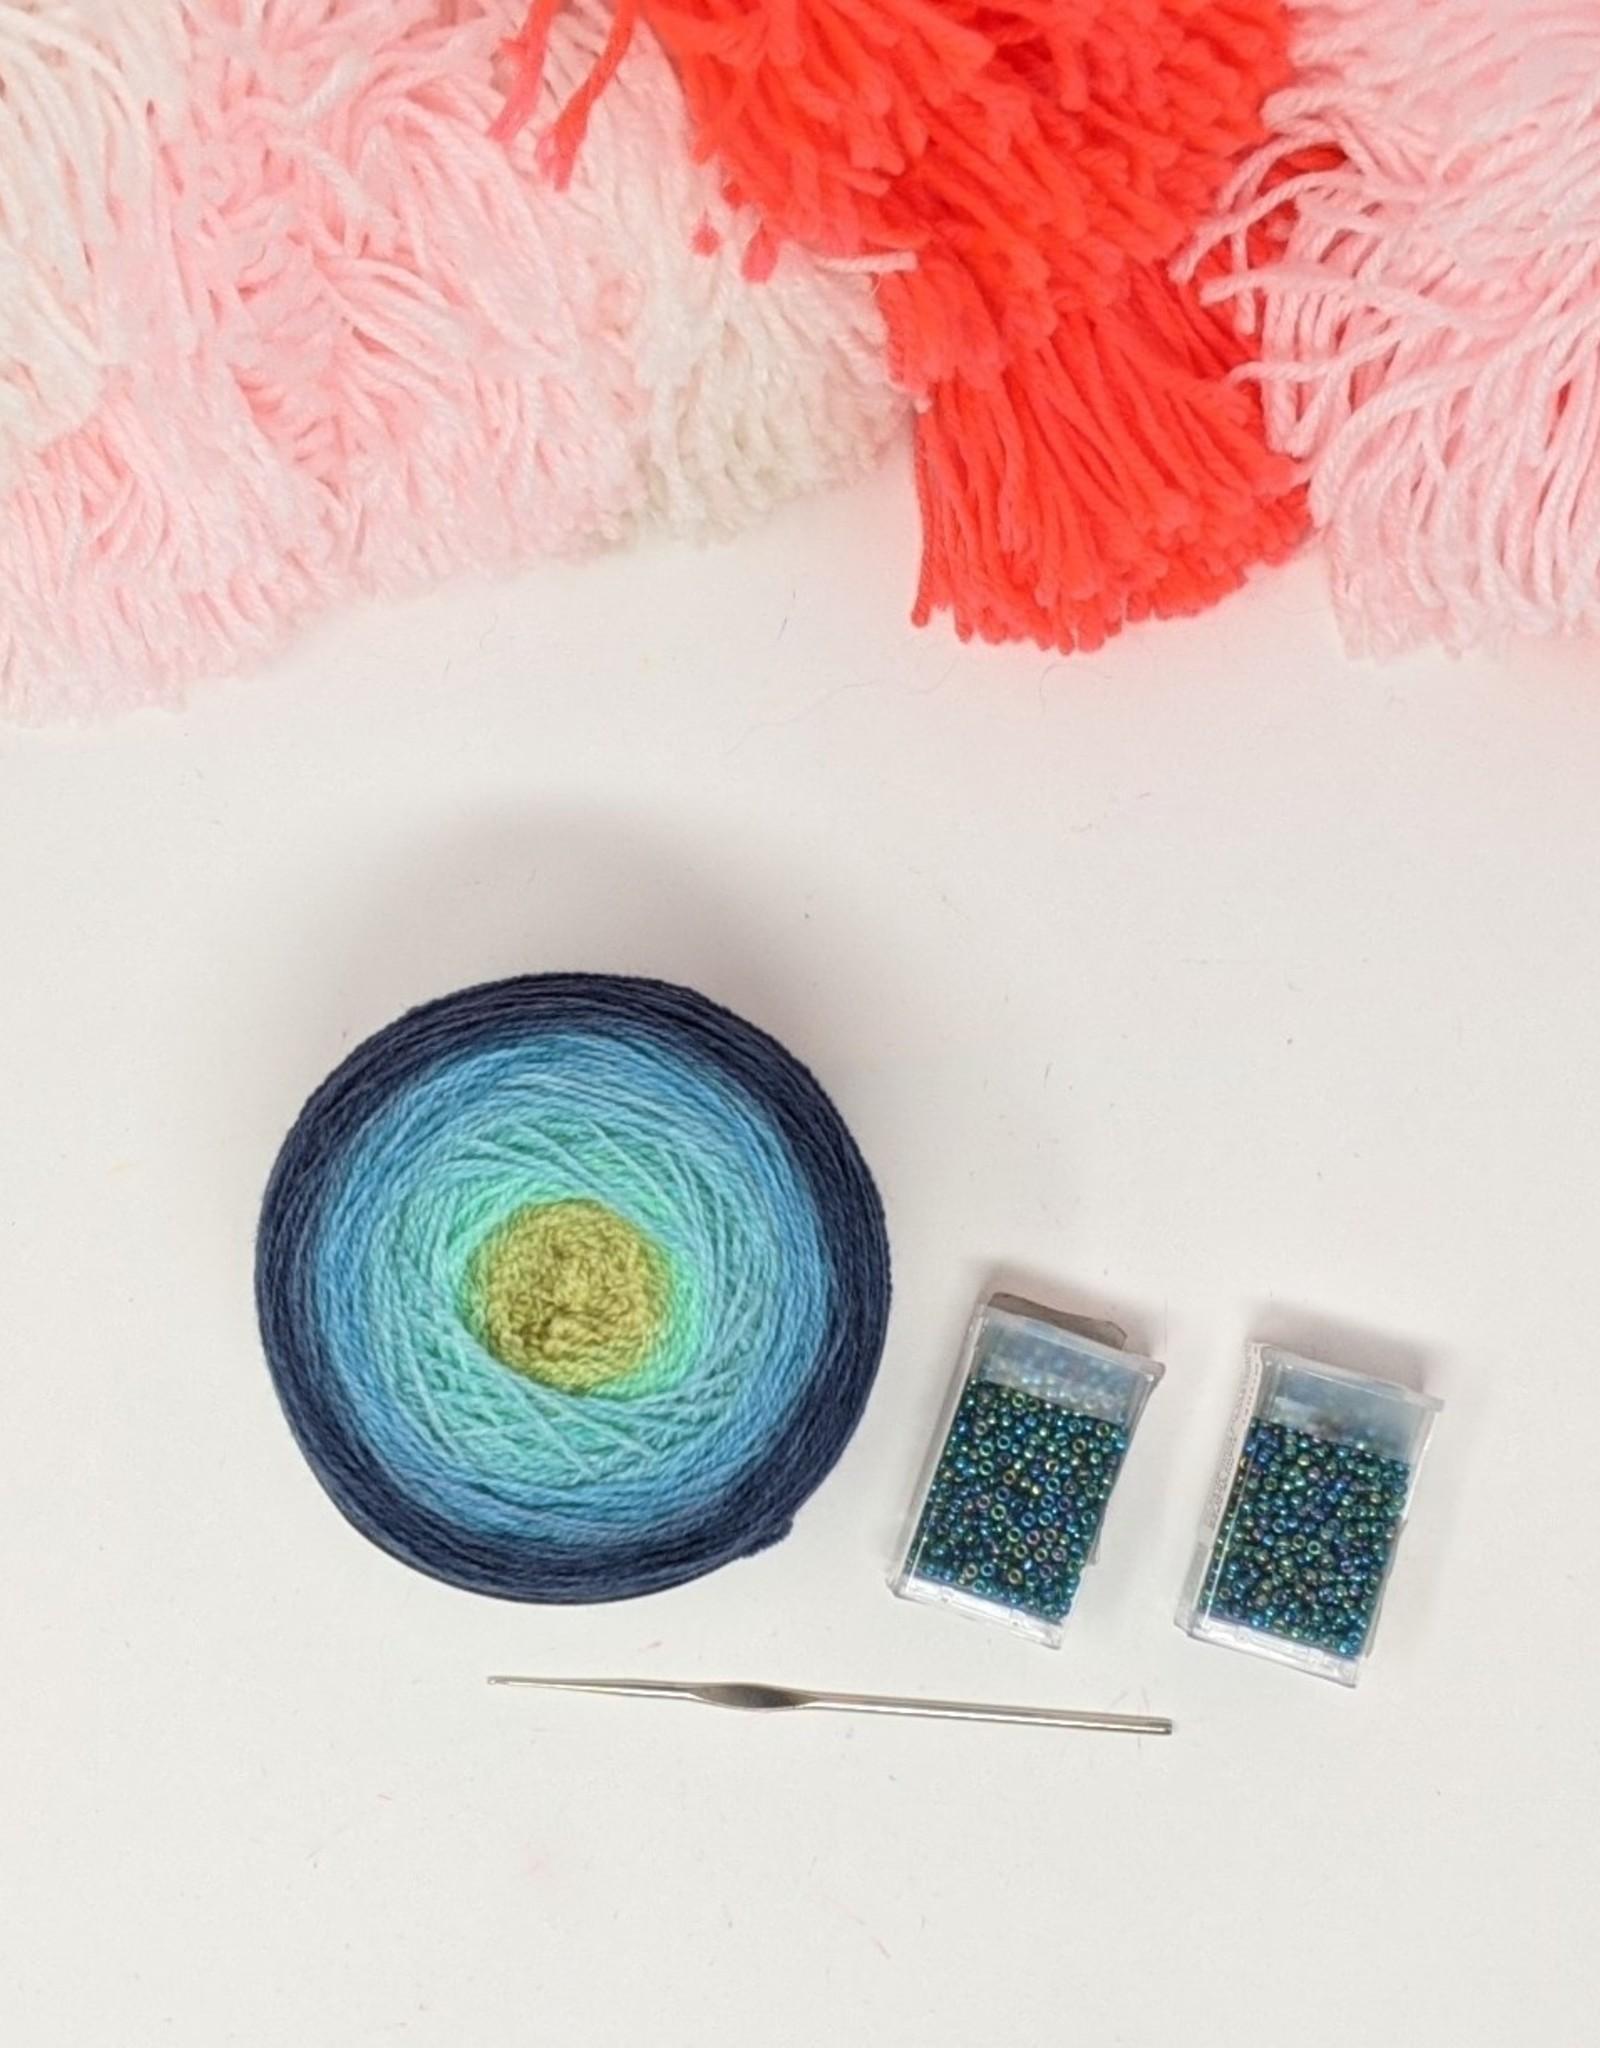 fibre space Beaded Lace Shawl Kit - Aurora